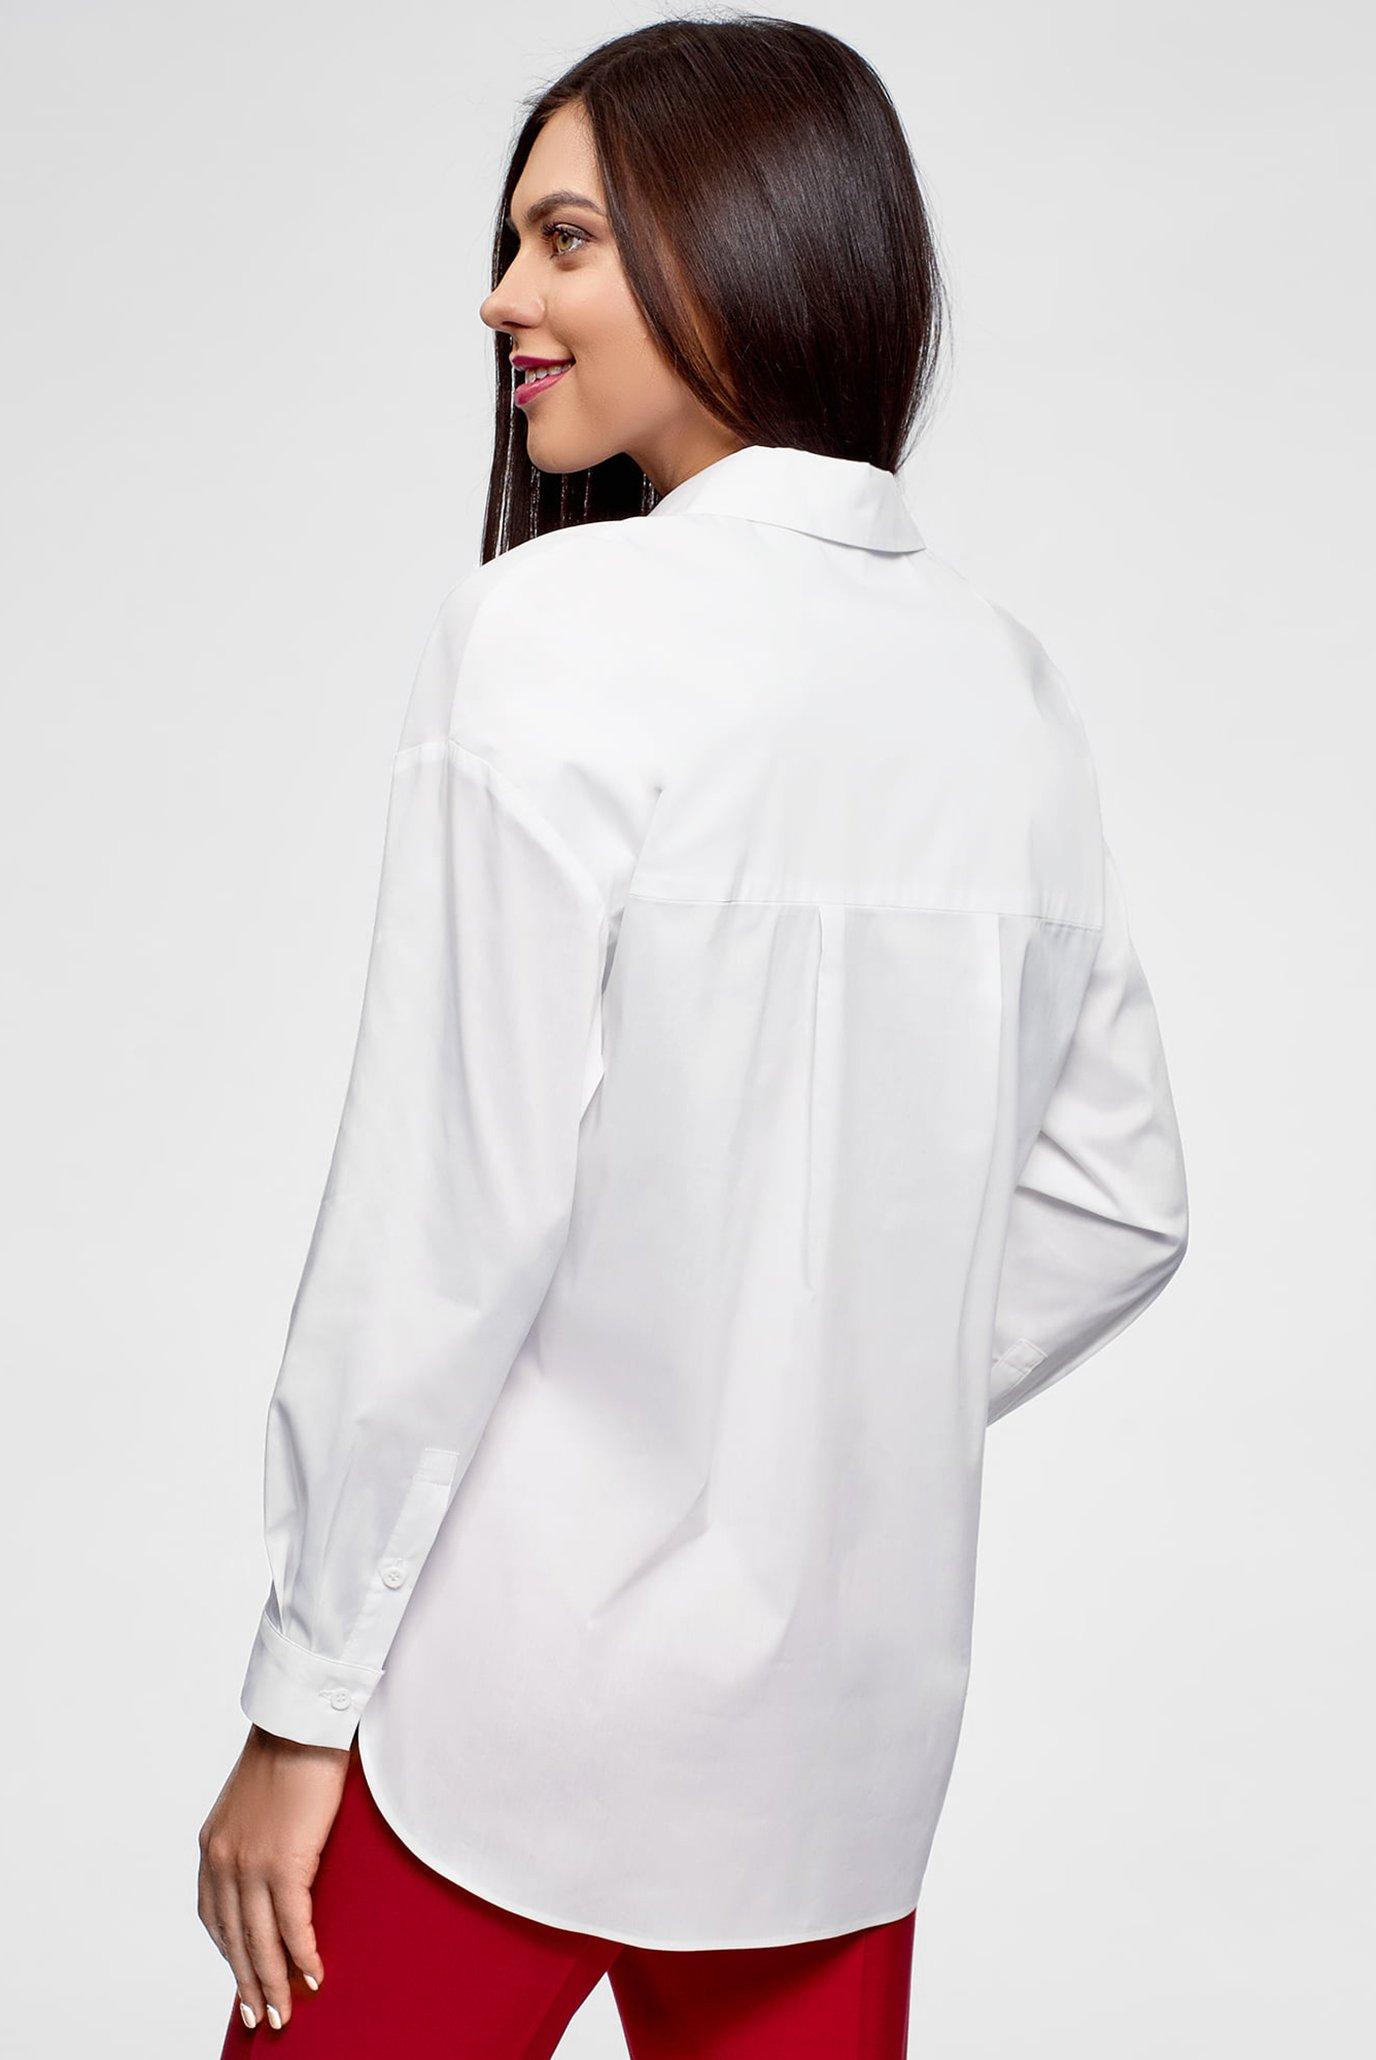 fd088675c1b2ea1 Купить Женская белая рубашка Oodji Oodji 13K11004/42785/1000N – Киев,  Украина. Цены в интернет магазине MD Fashion